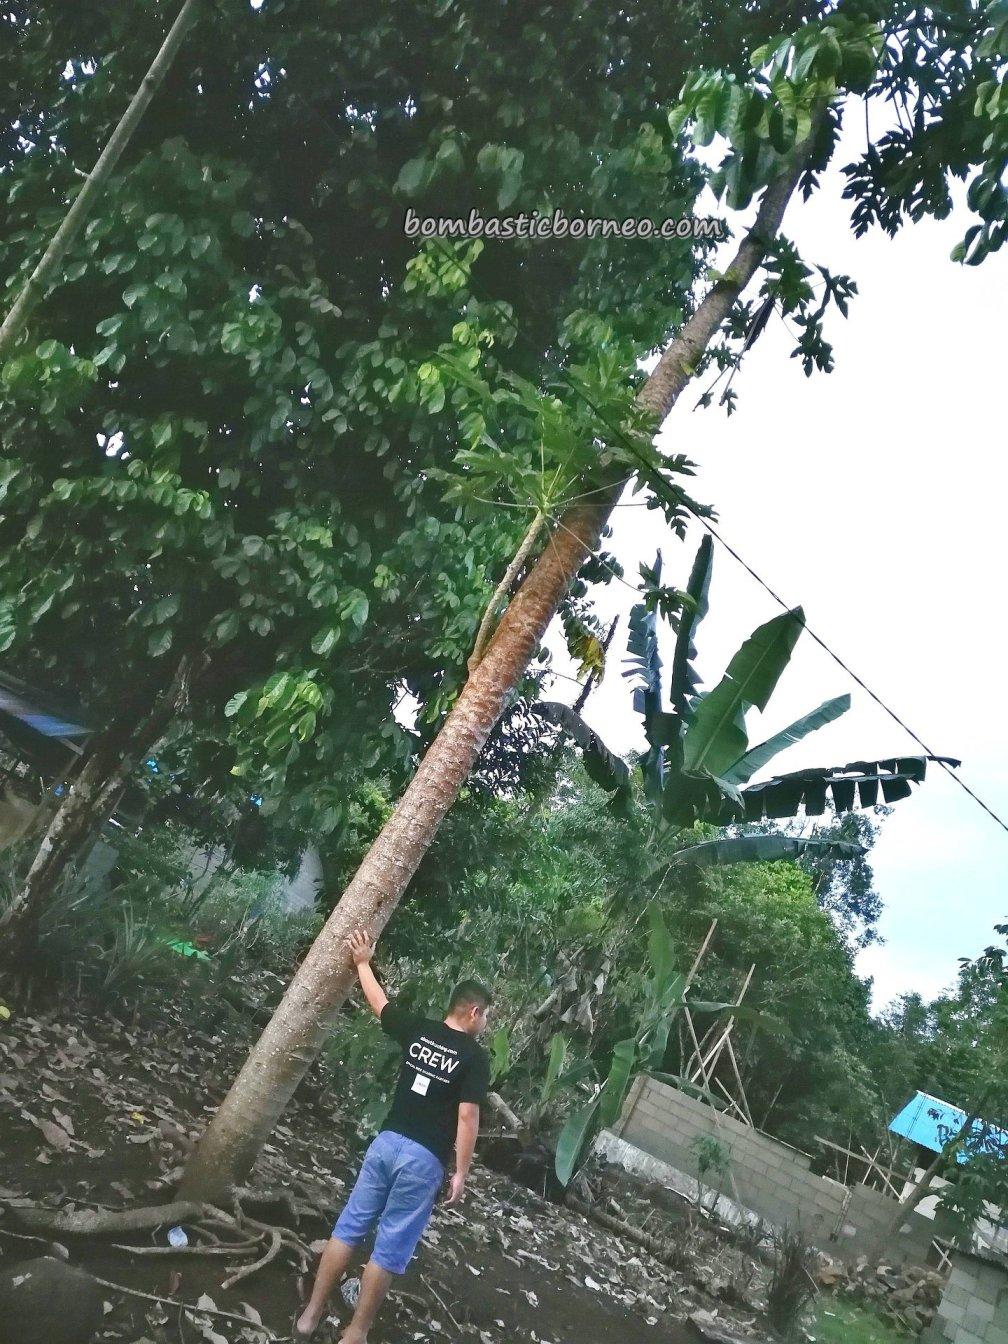 papaya tree, traditional, authentic, backpackers, destination, Borneo, Kalimantan Barat, Indonesia, Desa Bengkilu, Tujuh Belas, native, Tourism, travel guide, transborder, 孟加映西加里曼丹,